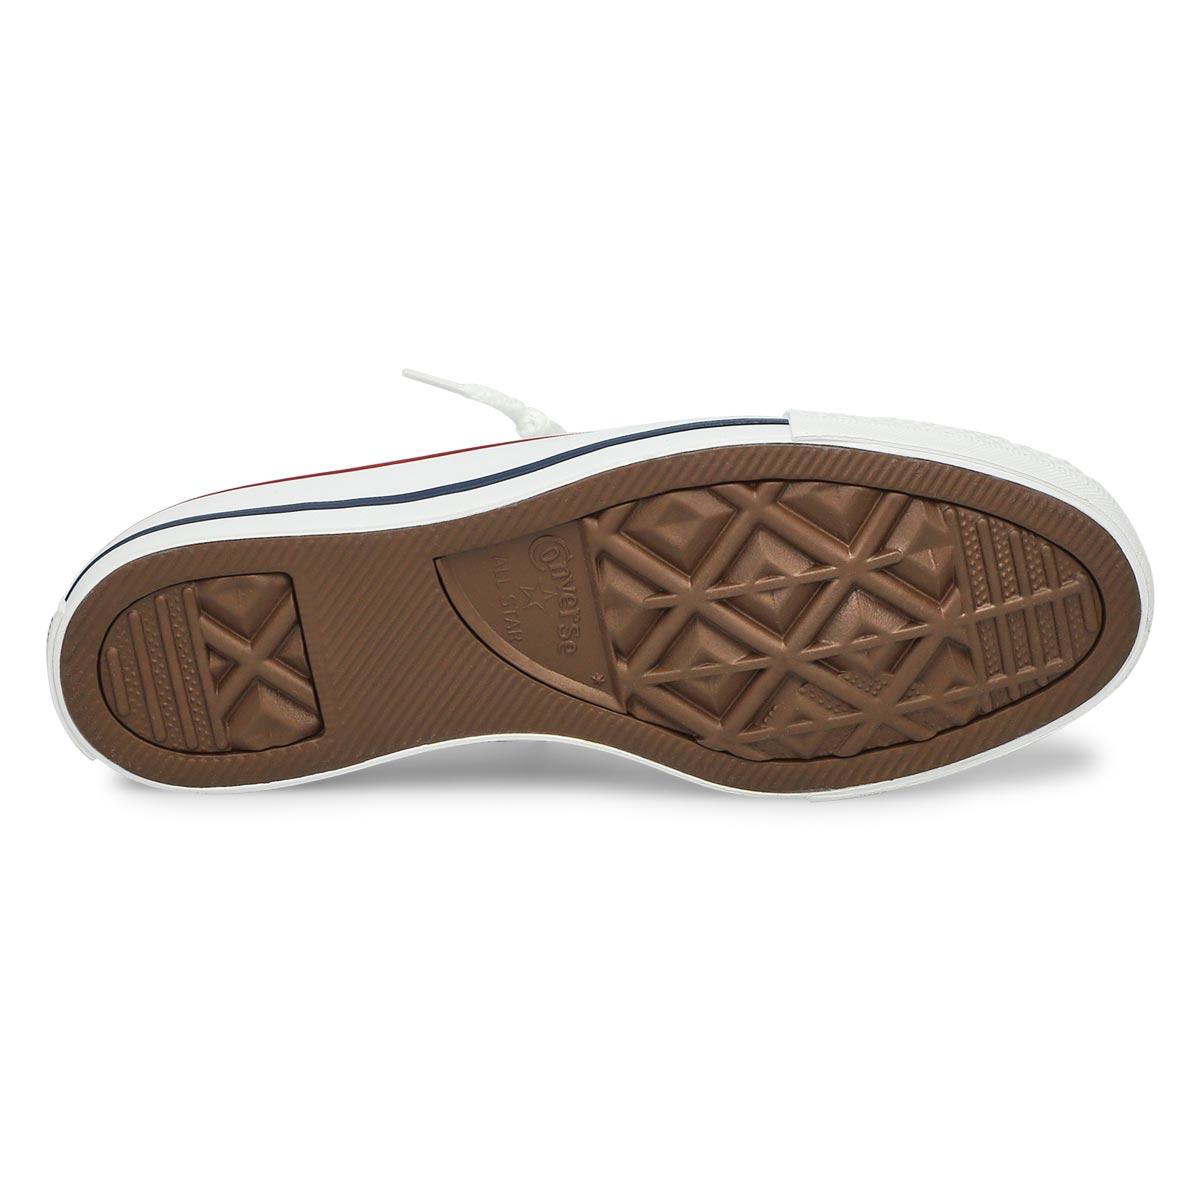 Lds CT A/S Shoreline white sneaker